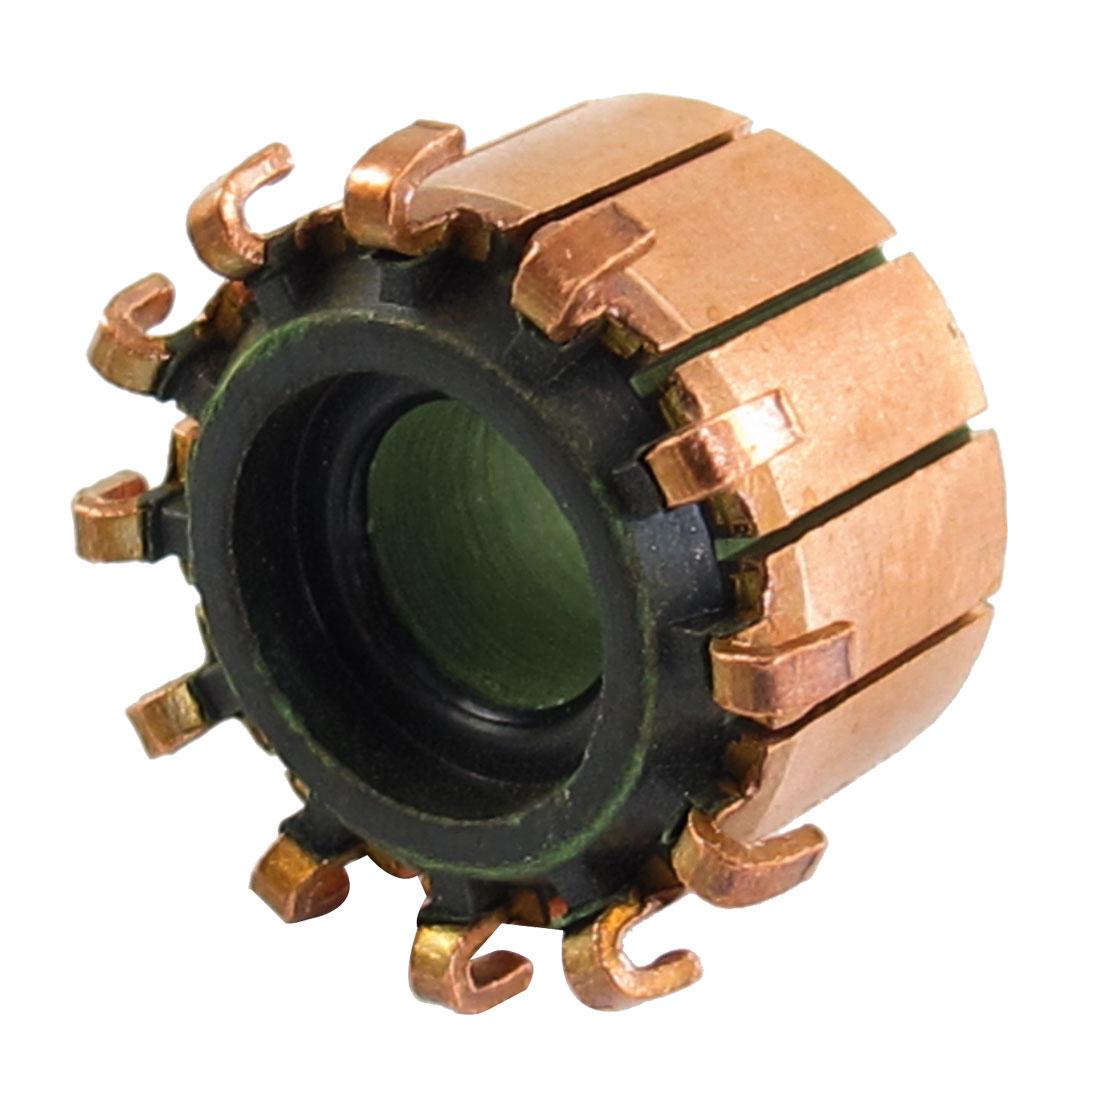 8mm x 18.9mm x 13.5mm Copper Case Auto Alternator Motor Power Tool Commutator